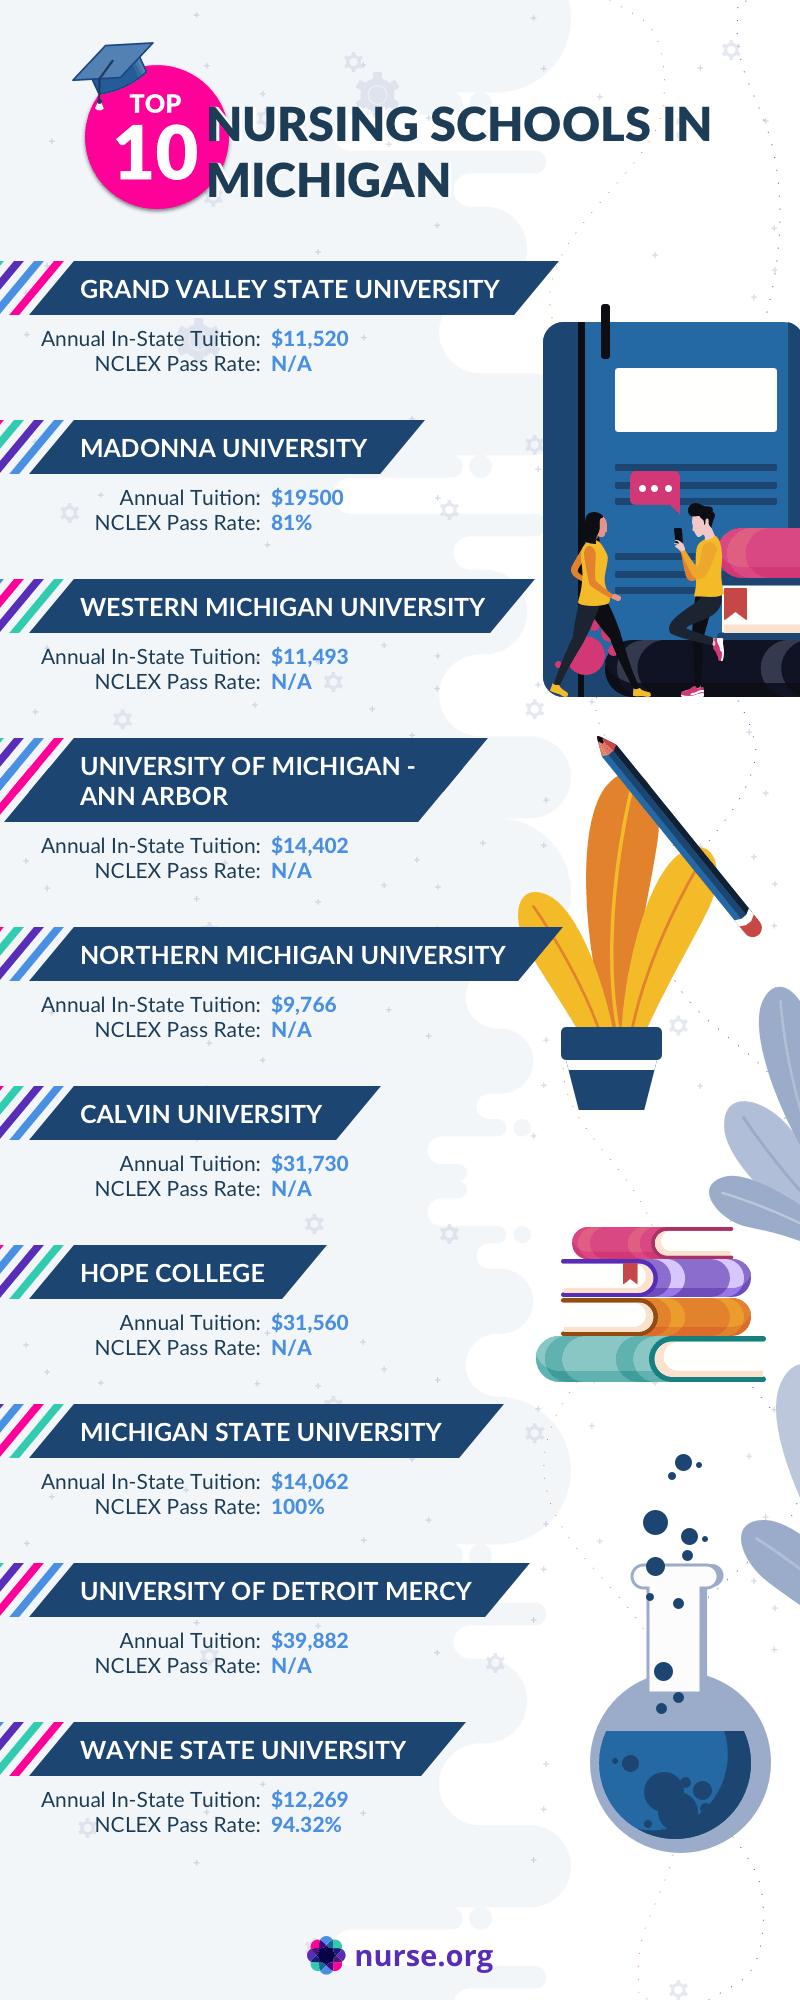 Infographic comparing the top nursing schools in Michigan